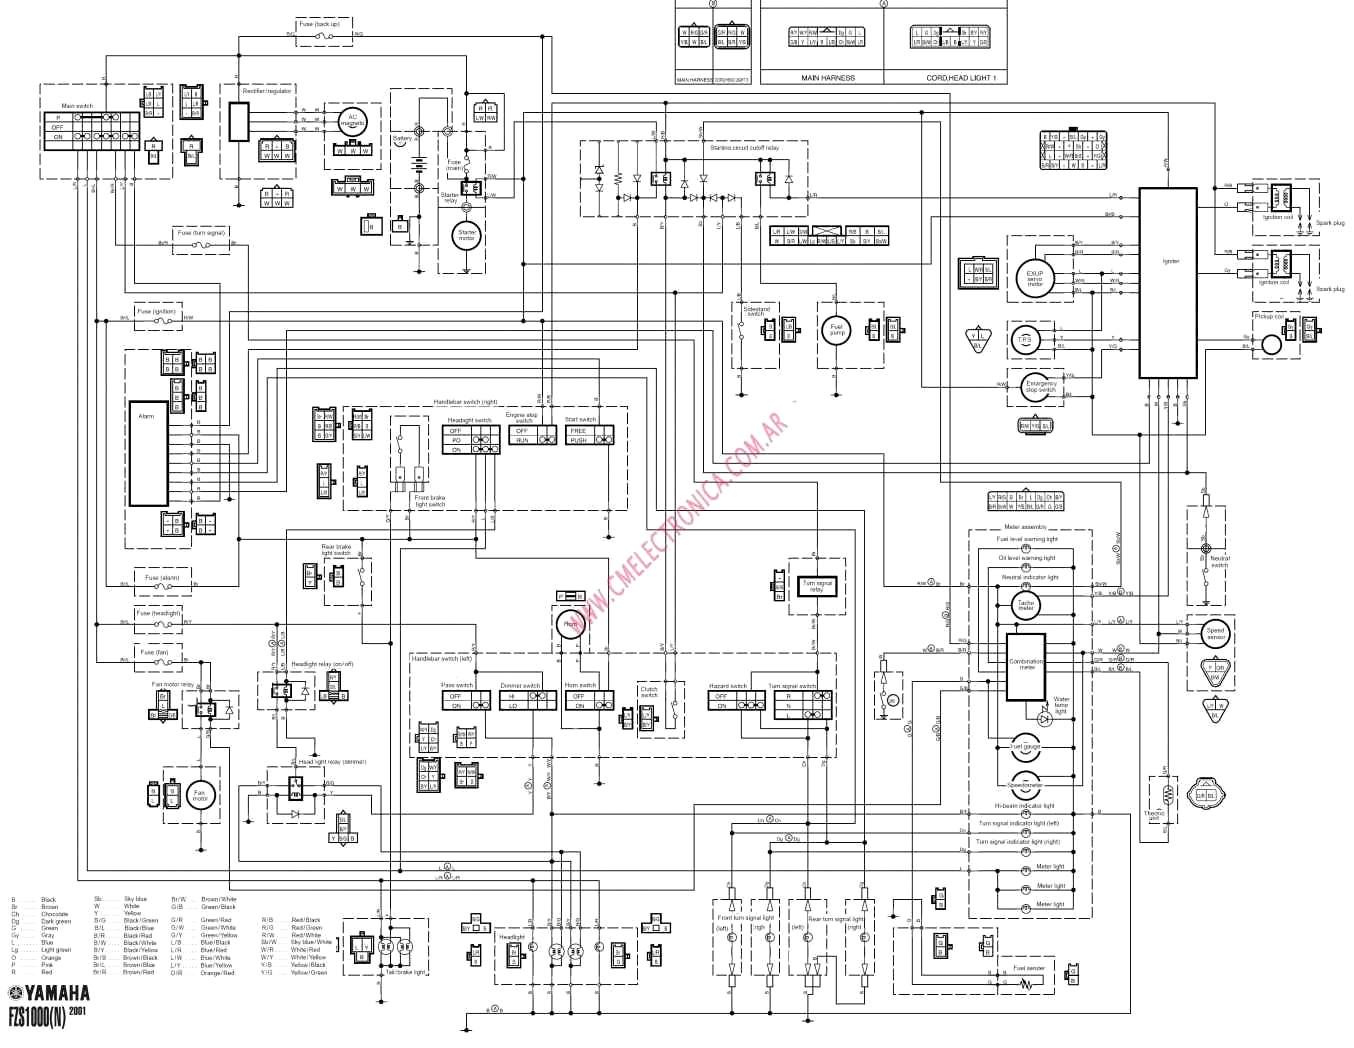 harley vl wiring diagram